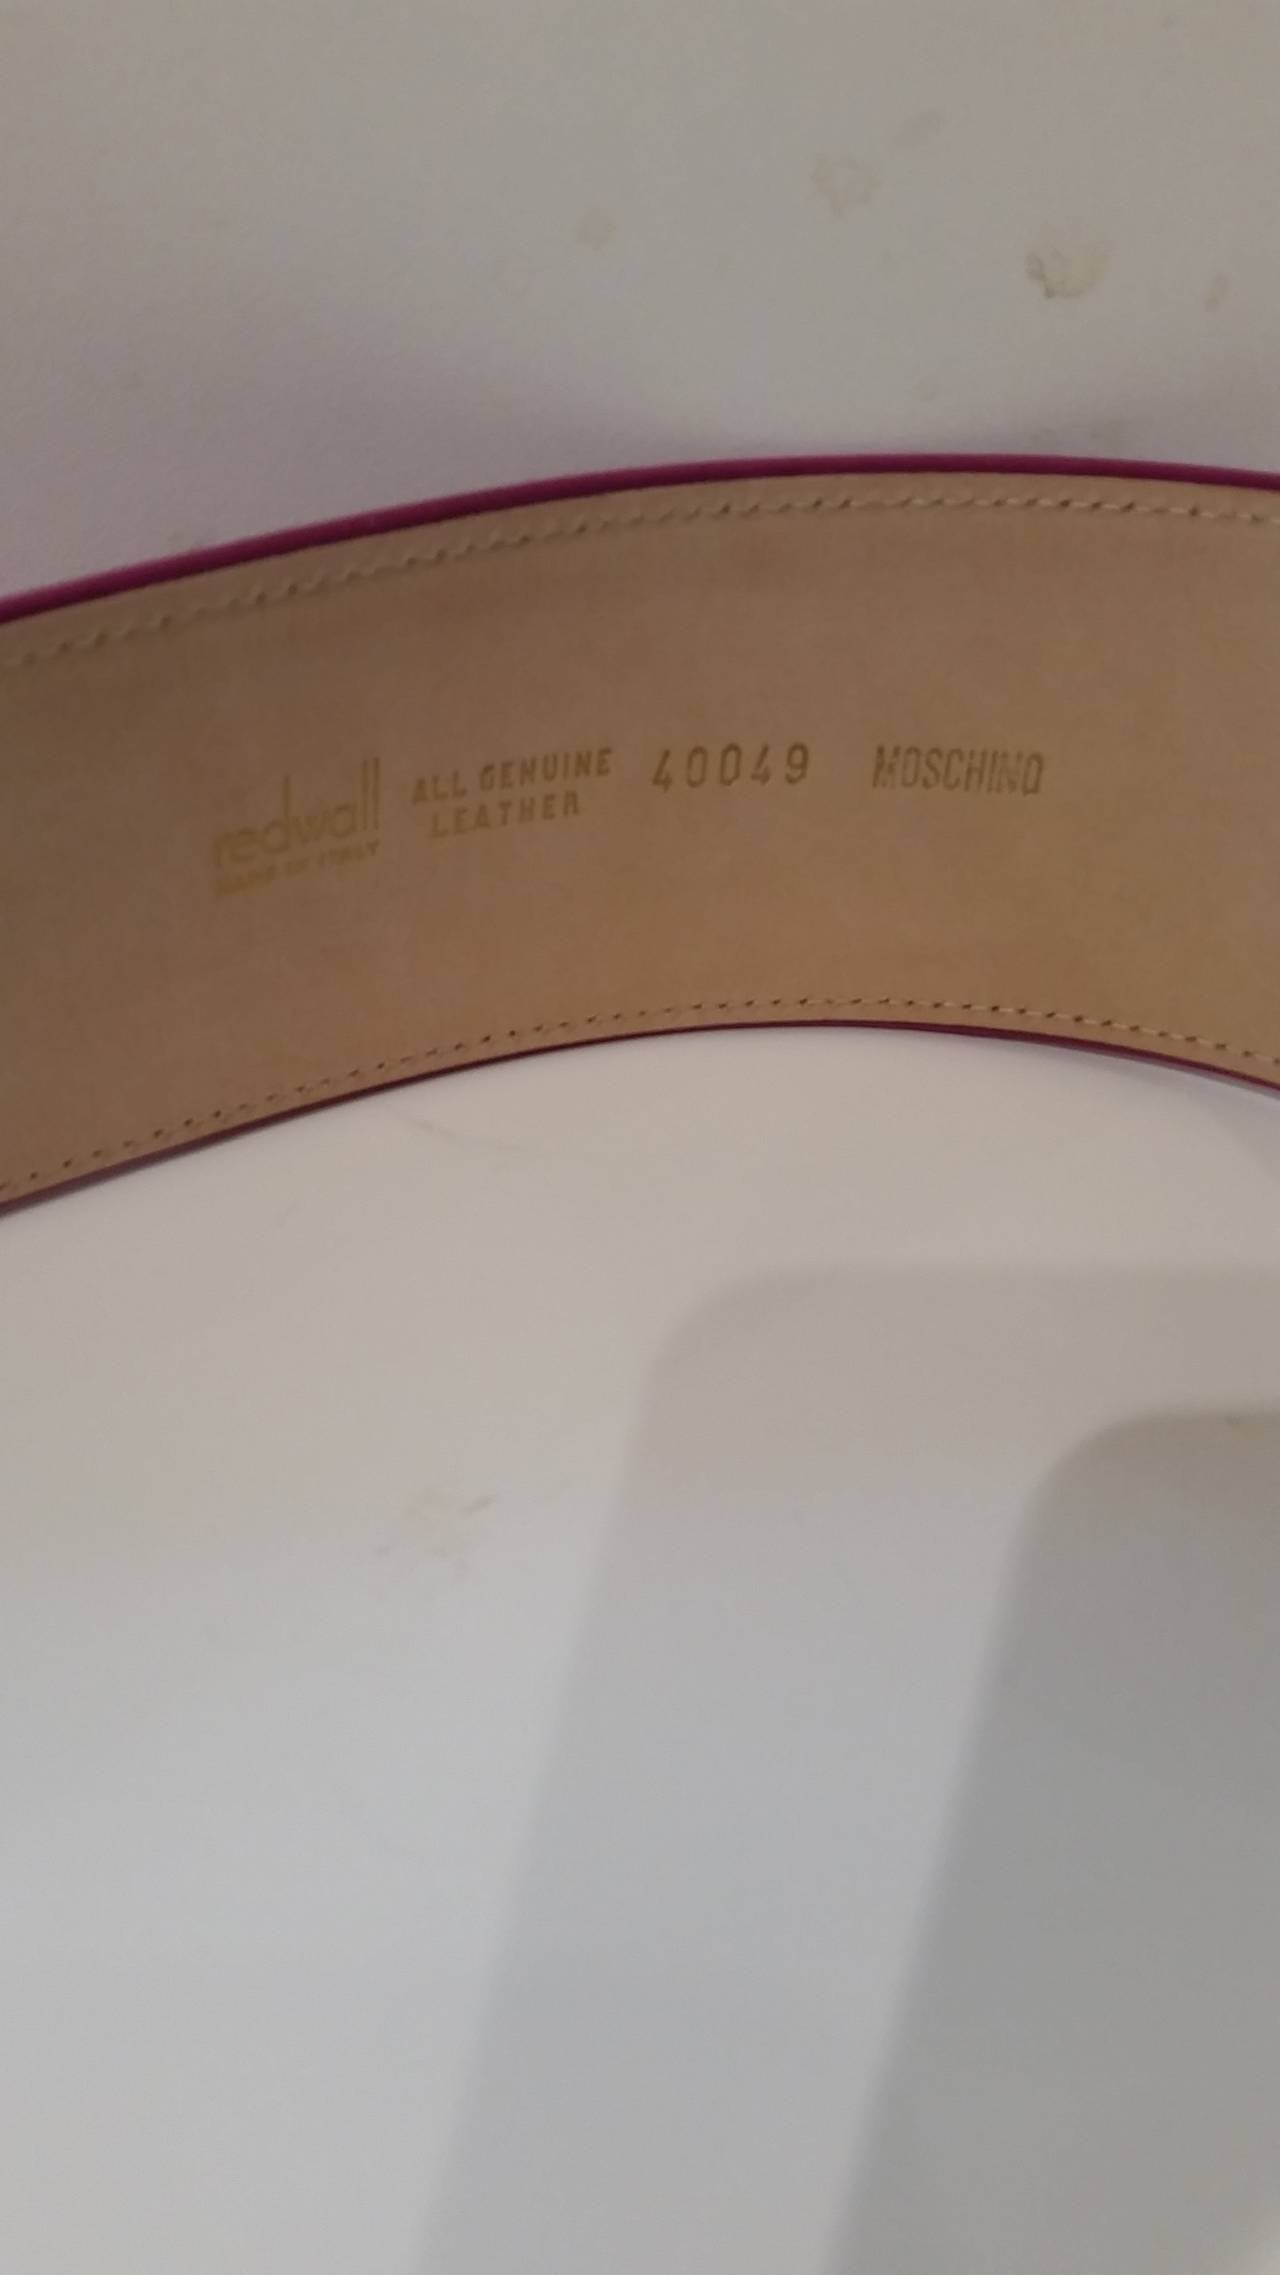 1970s Moschino Vintage fuchsia belt with Swarovski crystals 4